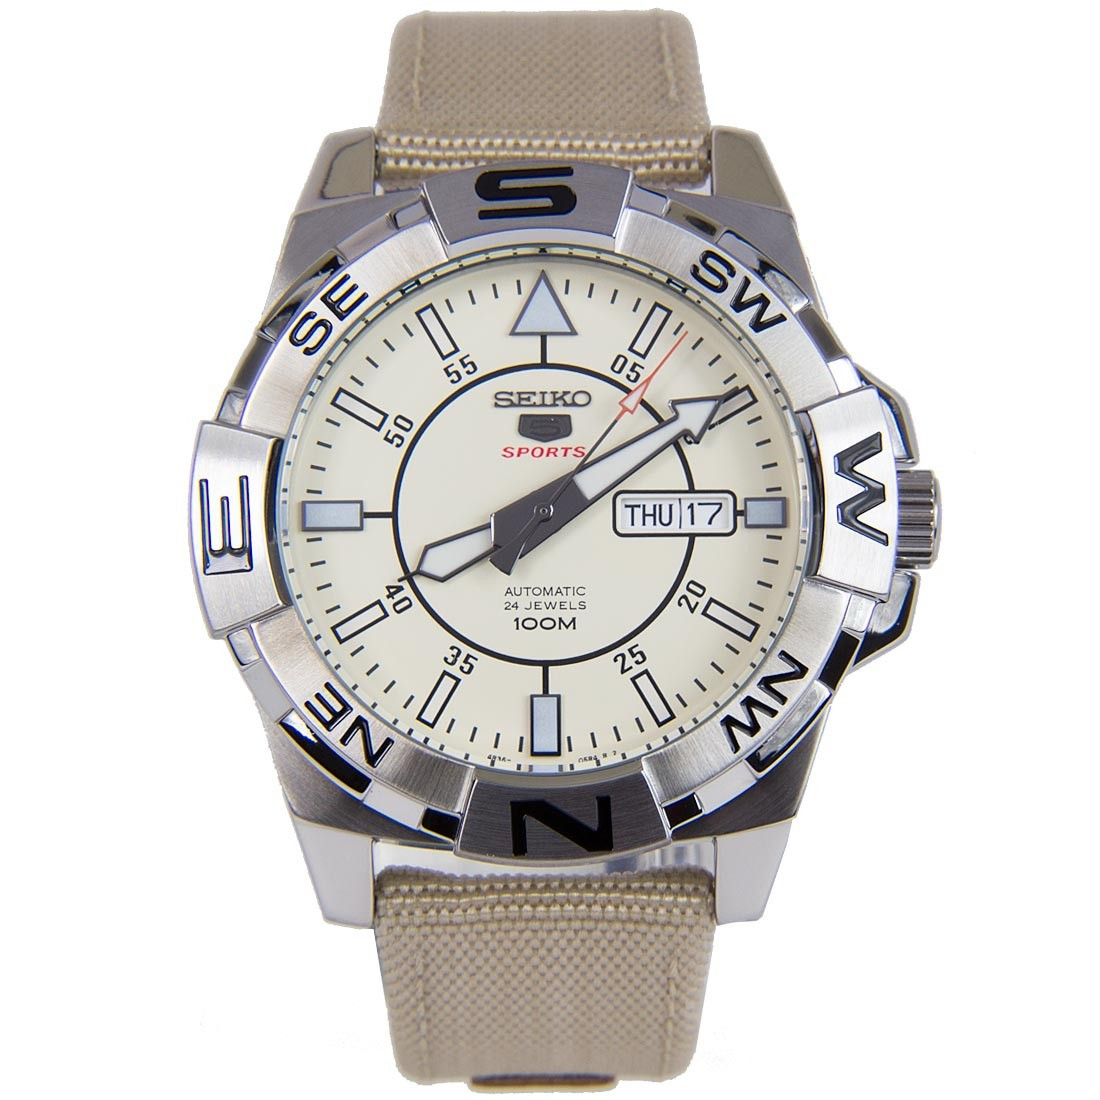 Часы Seiko 5 Sports SRPA67K1 Automatic 4R36